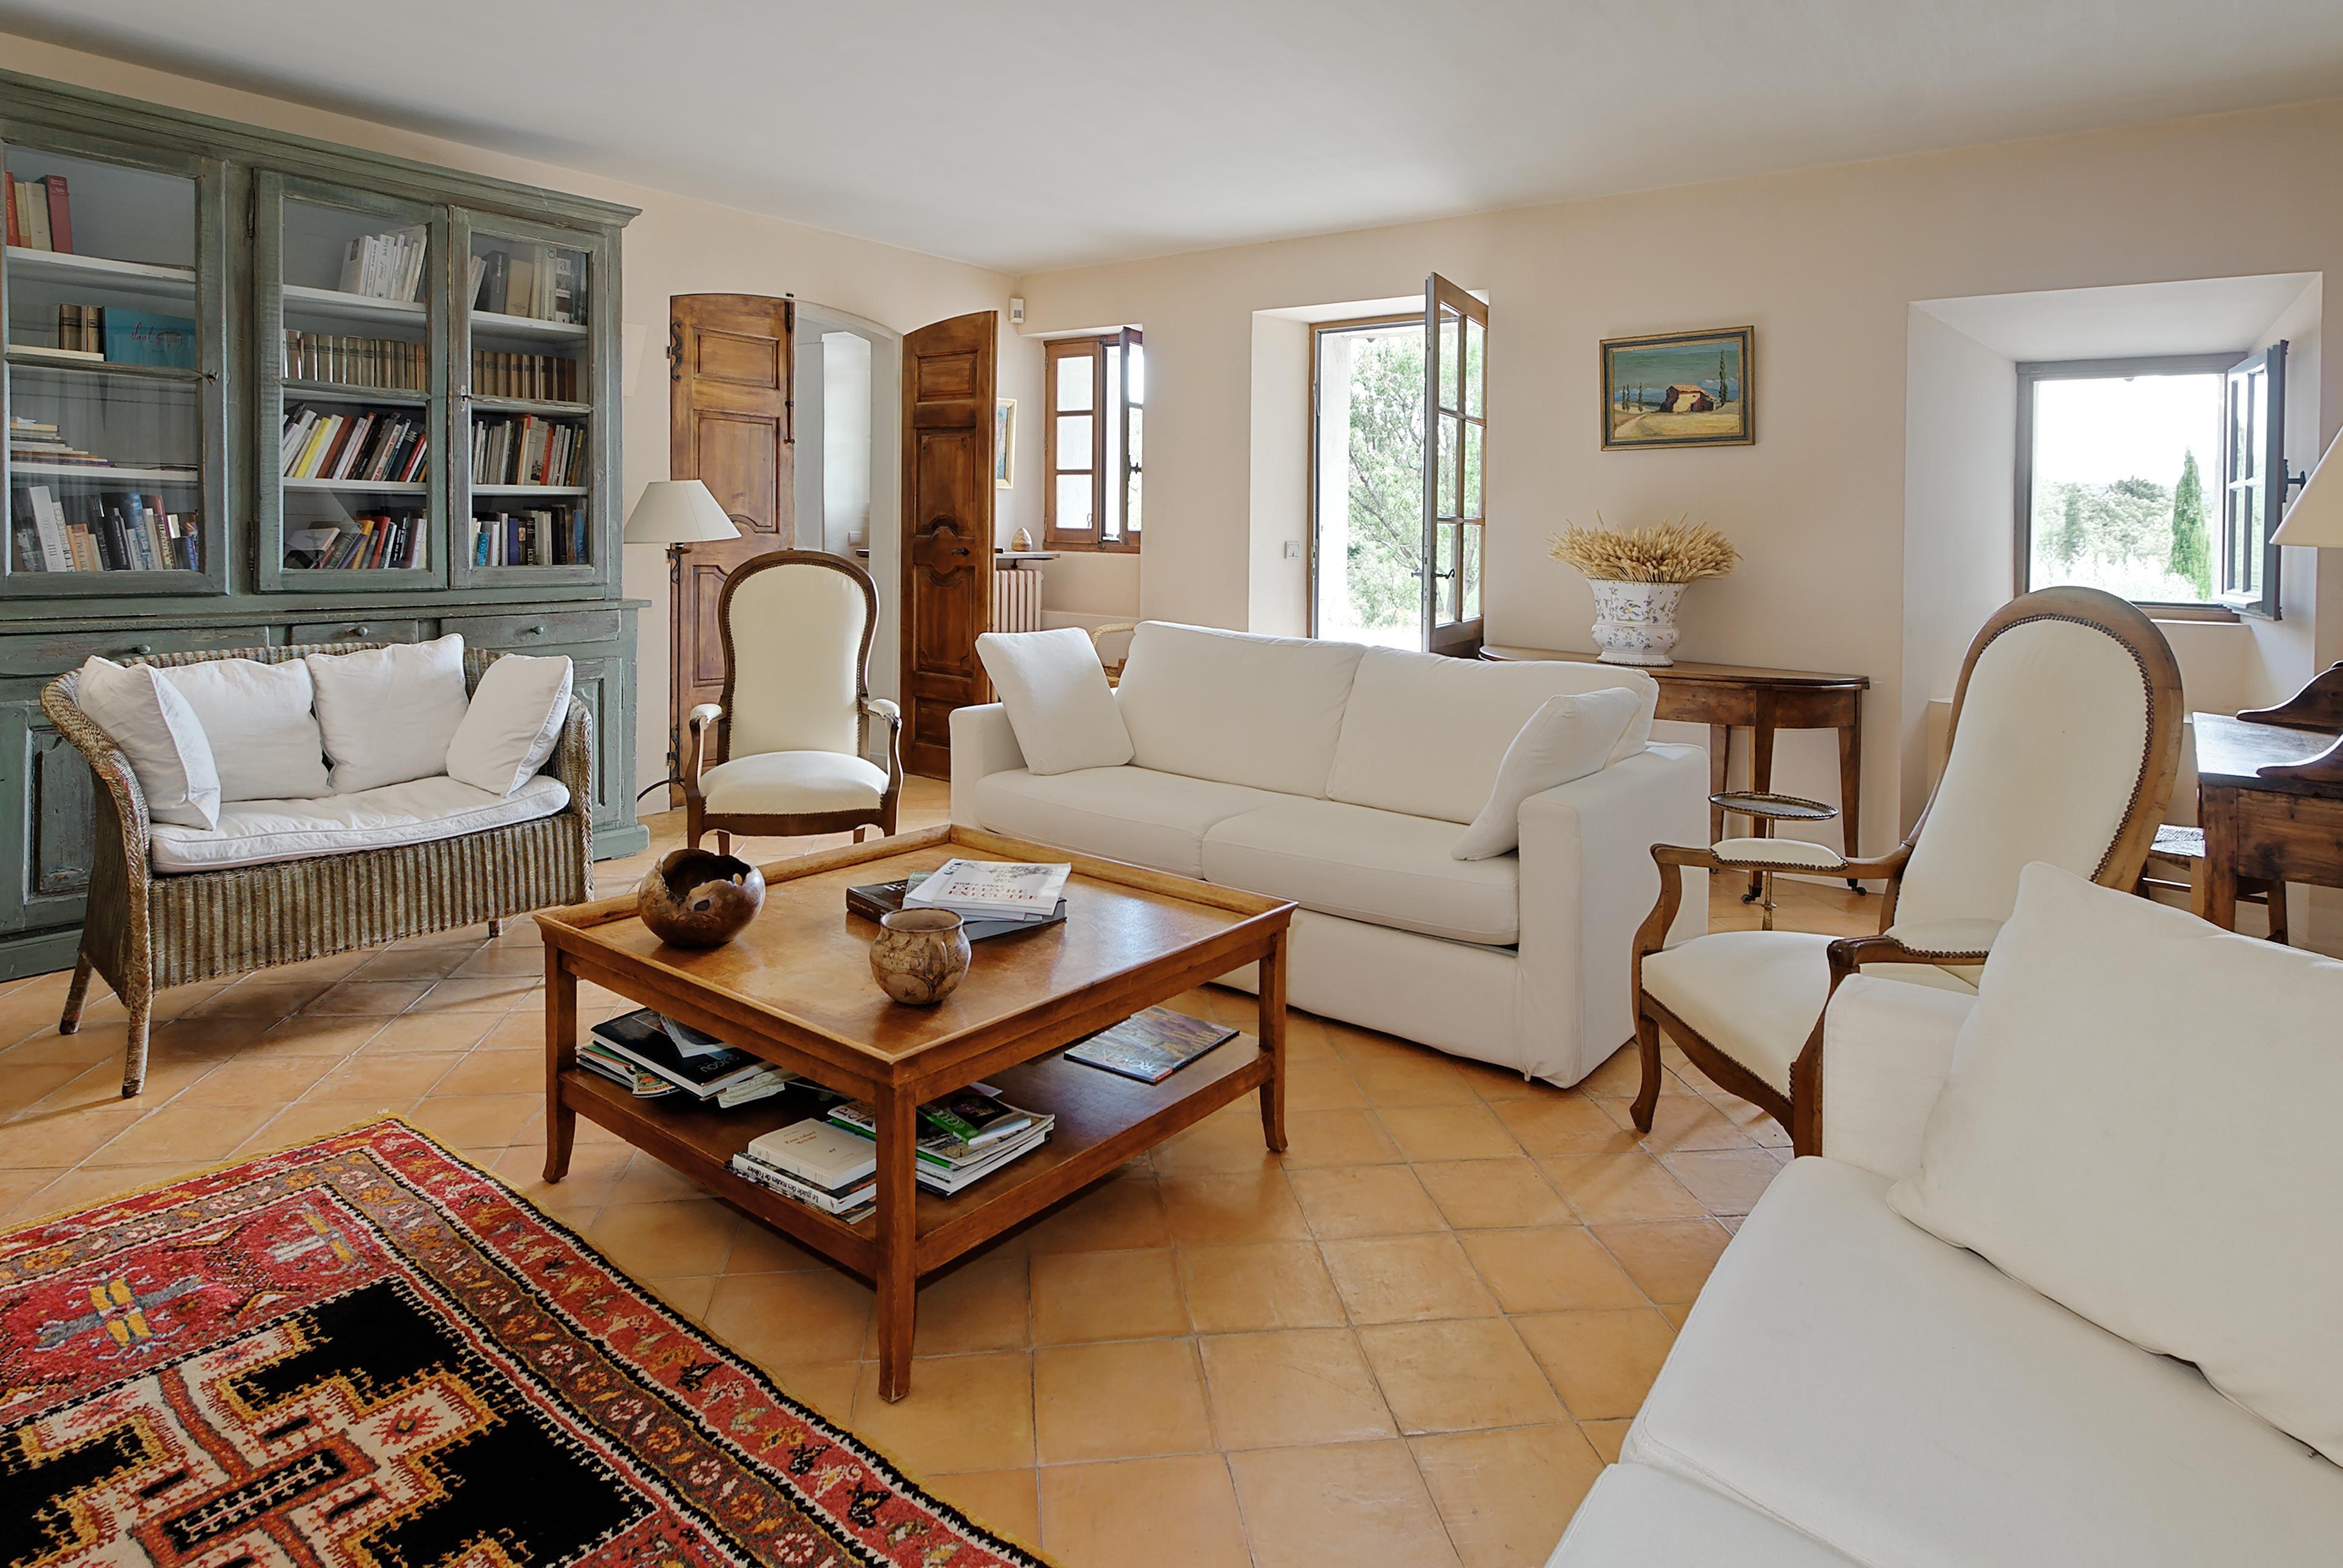 Chic interiors at Villa Le Mas de Caseneuve #Provence